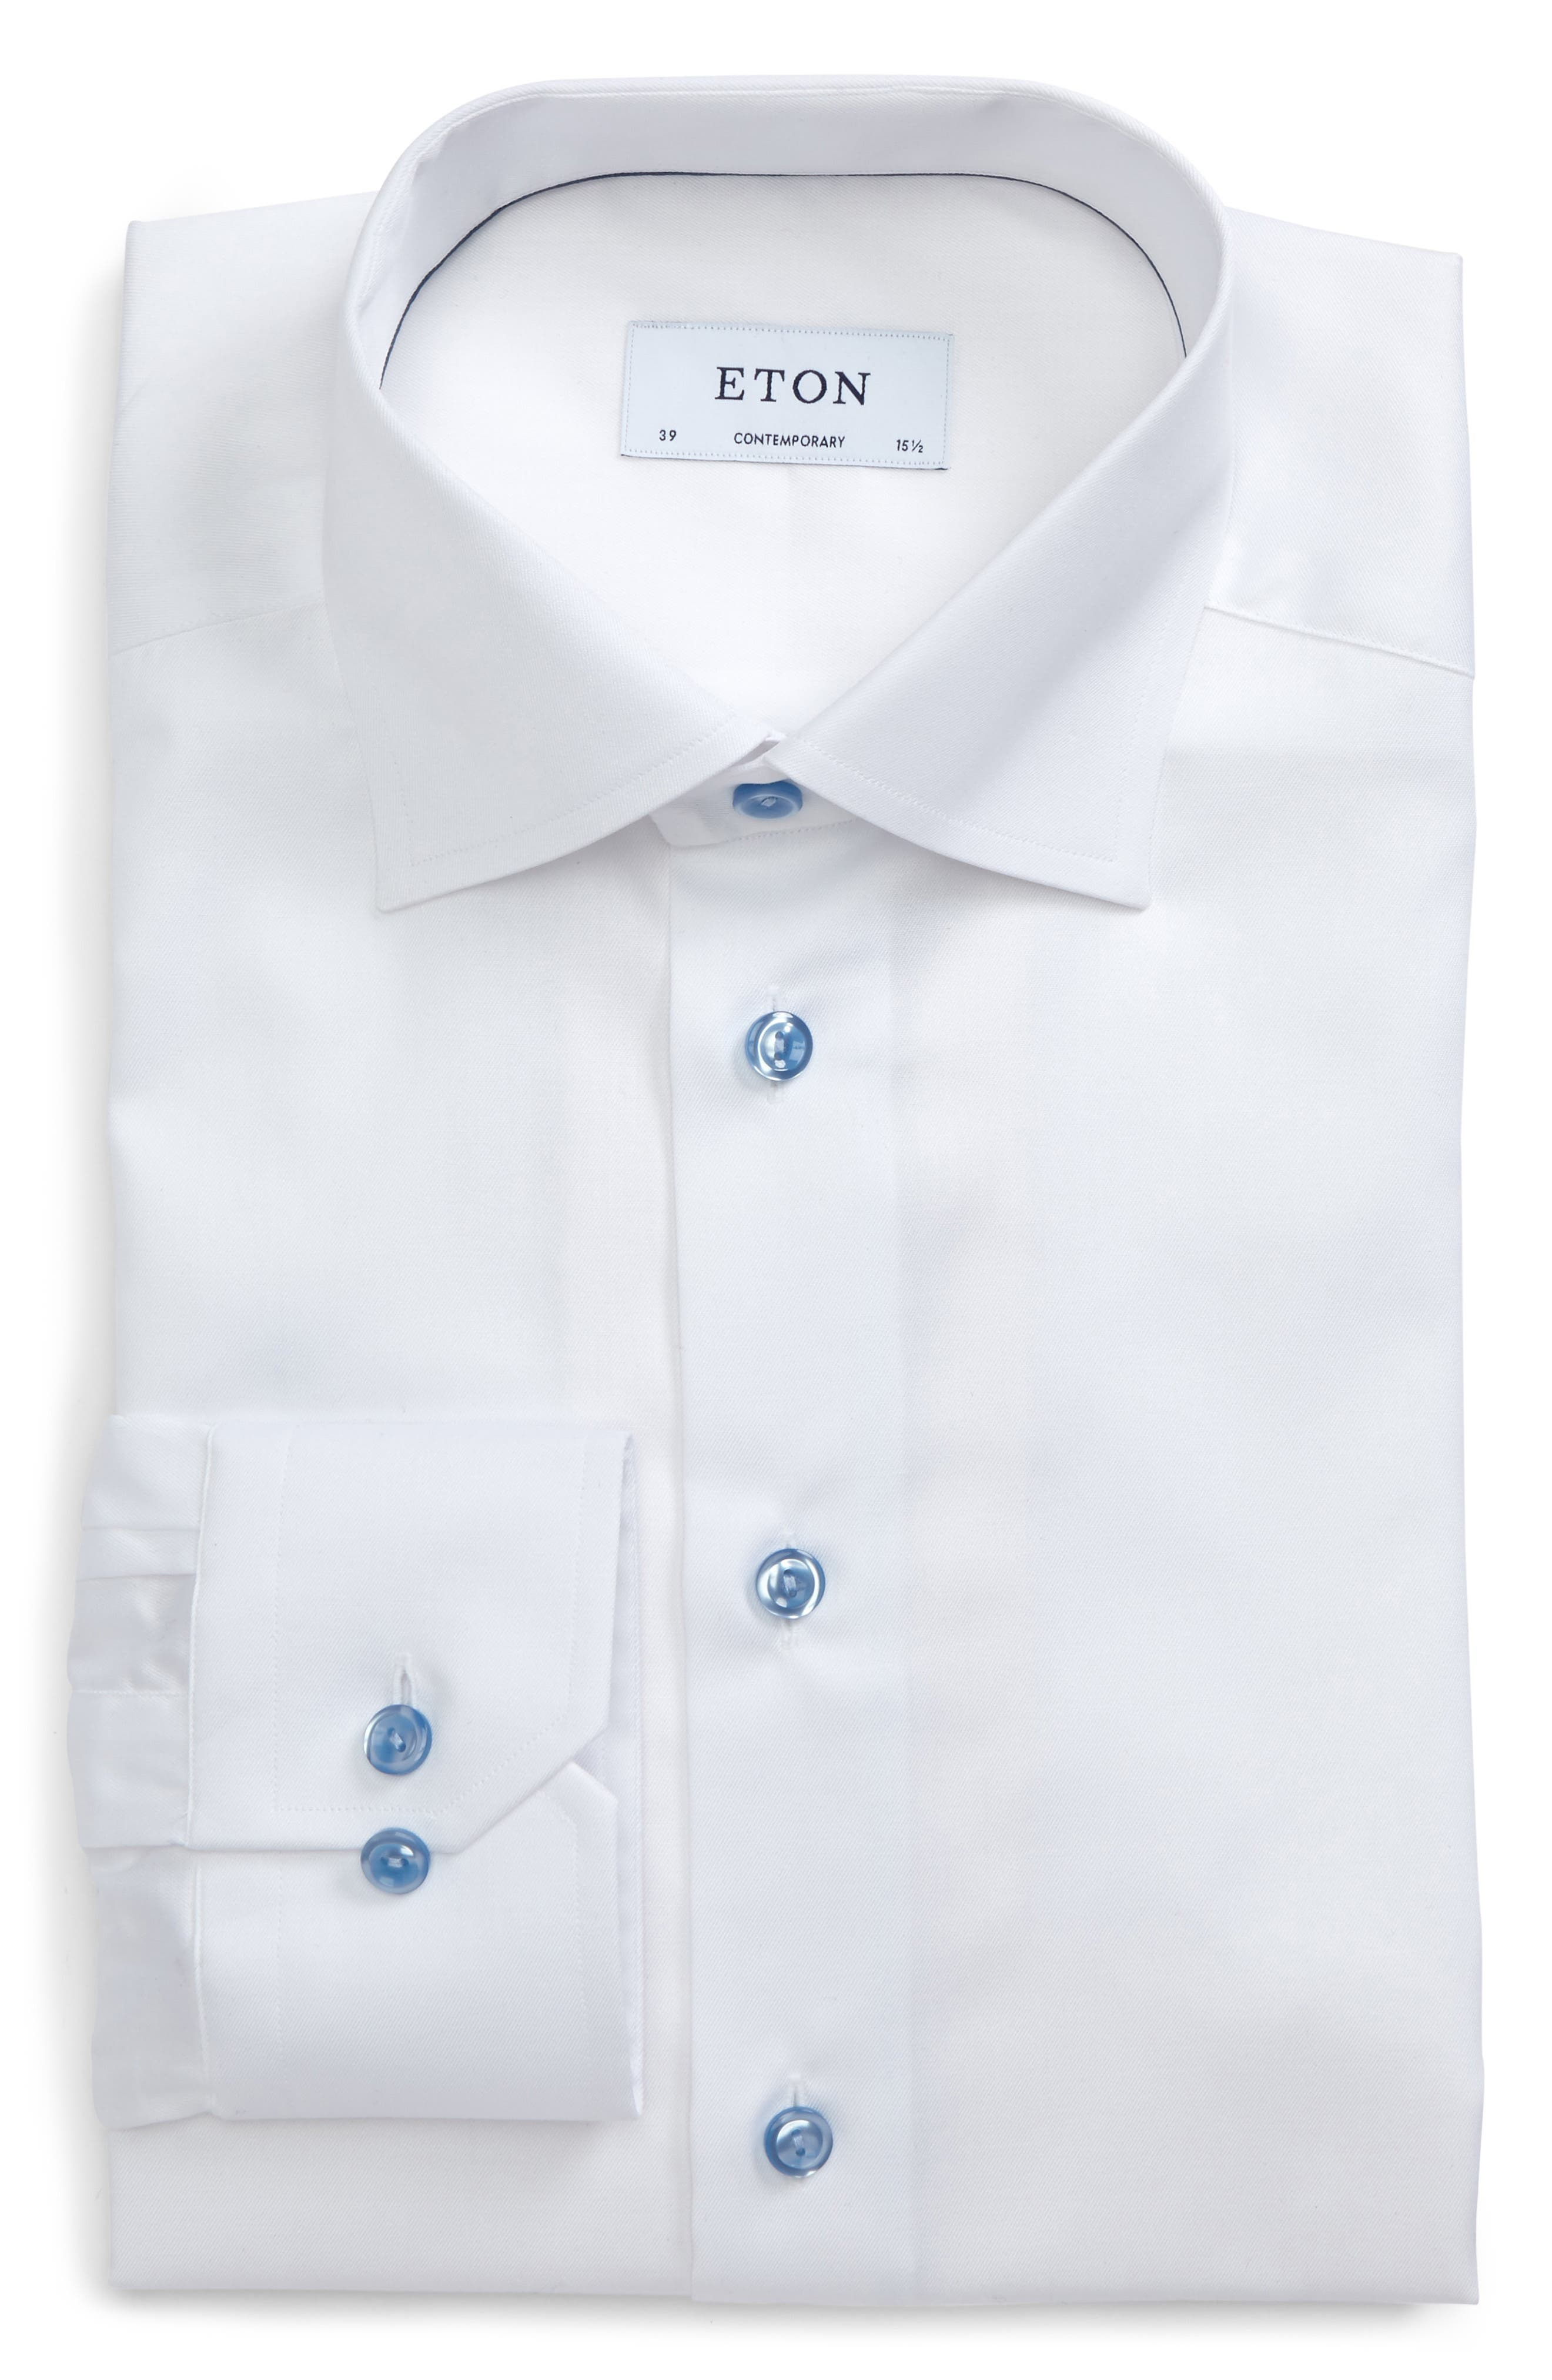 Eton Contemporary Fit Signature Twill Dress Shirt